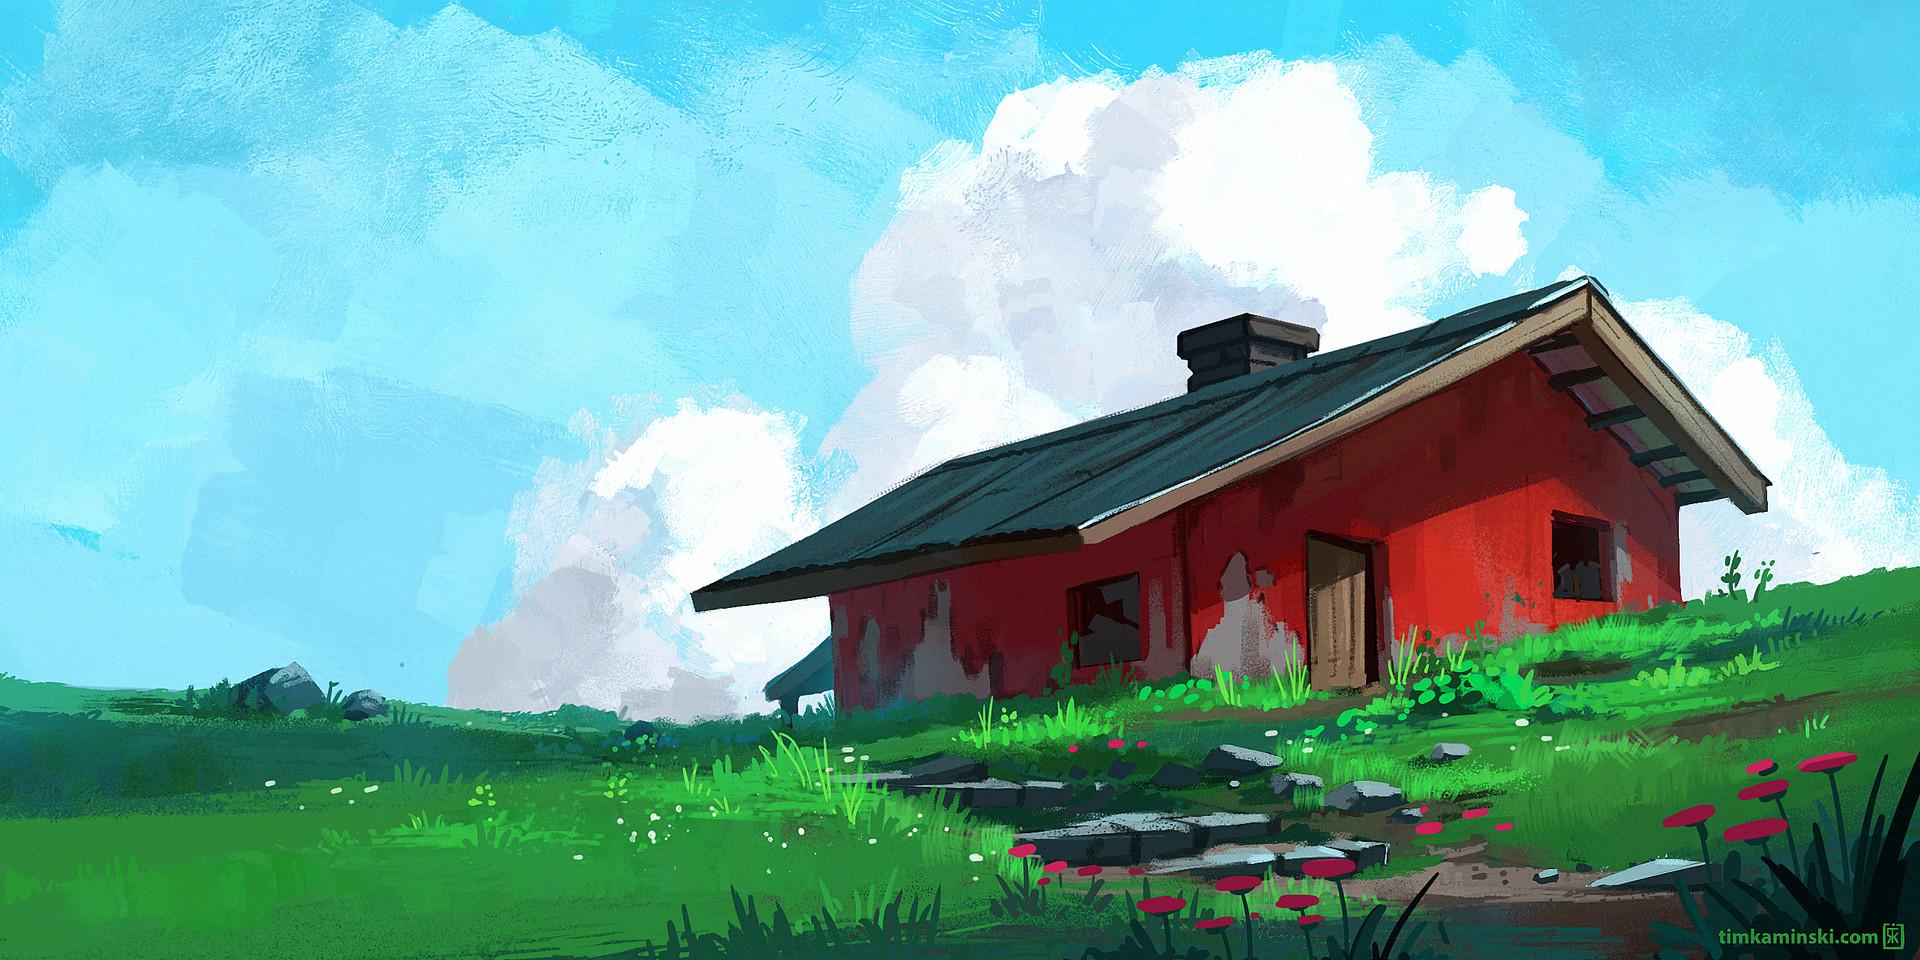 Tim kaminski red house